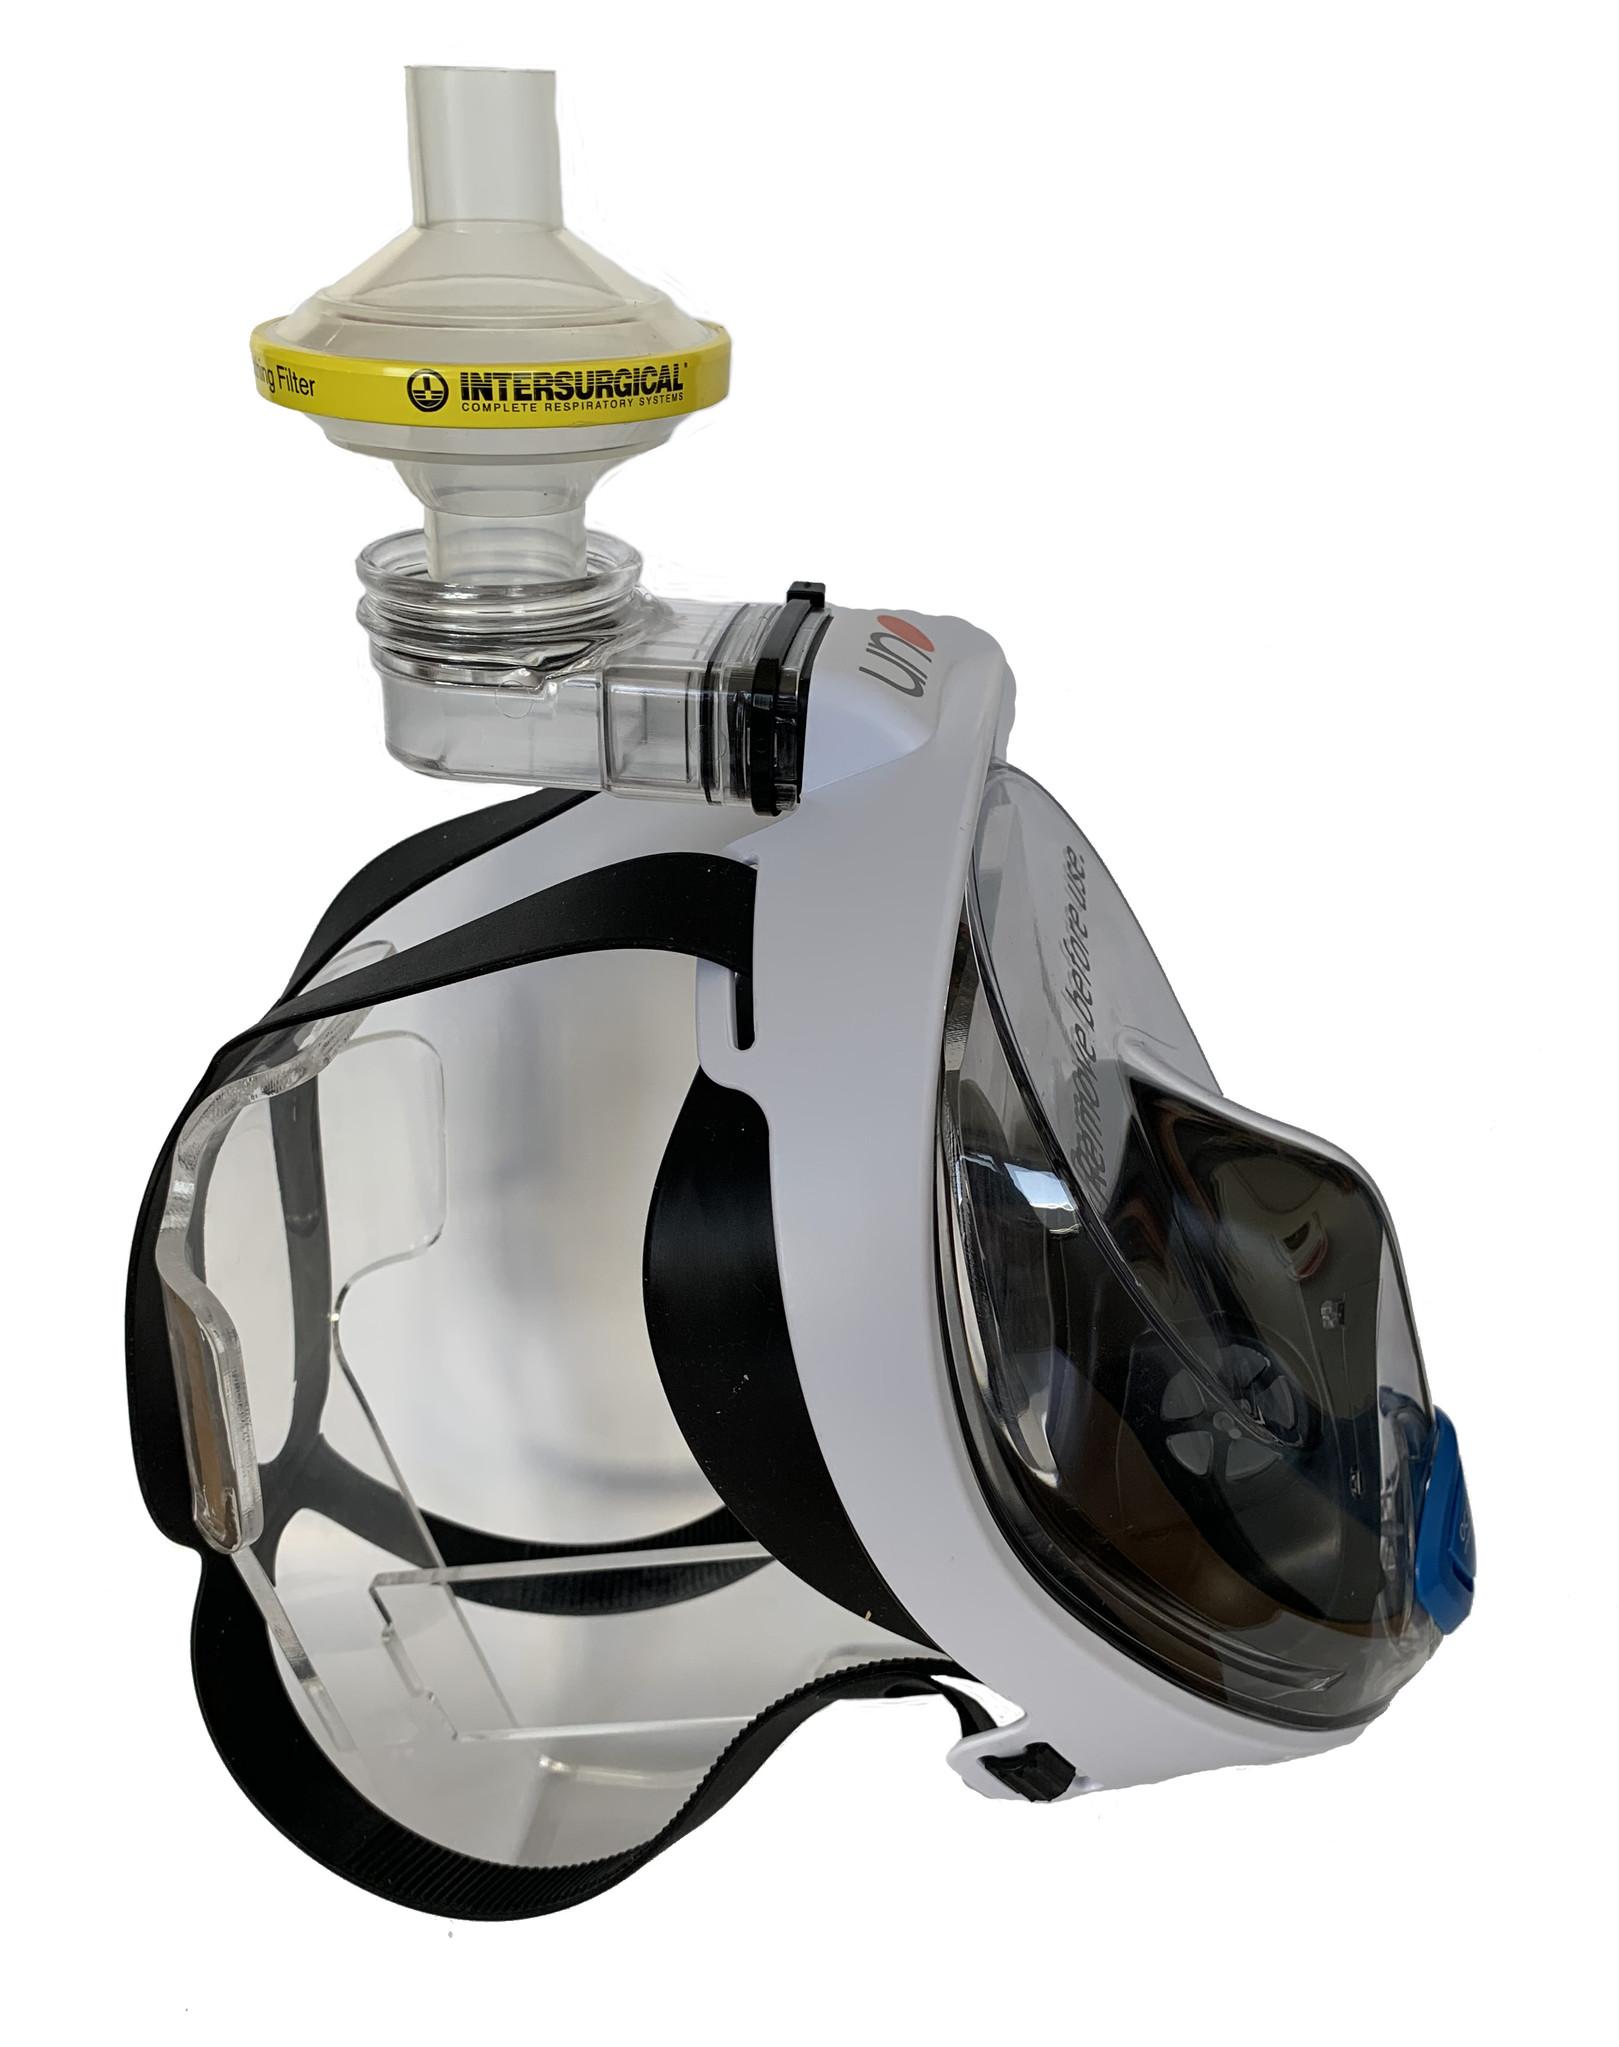 Ocean Reef Aria Classic/QR/Uno APA+RD40/22 MM Adaptor + Filter